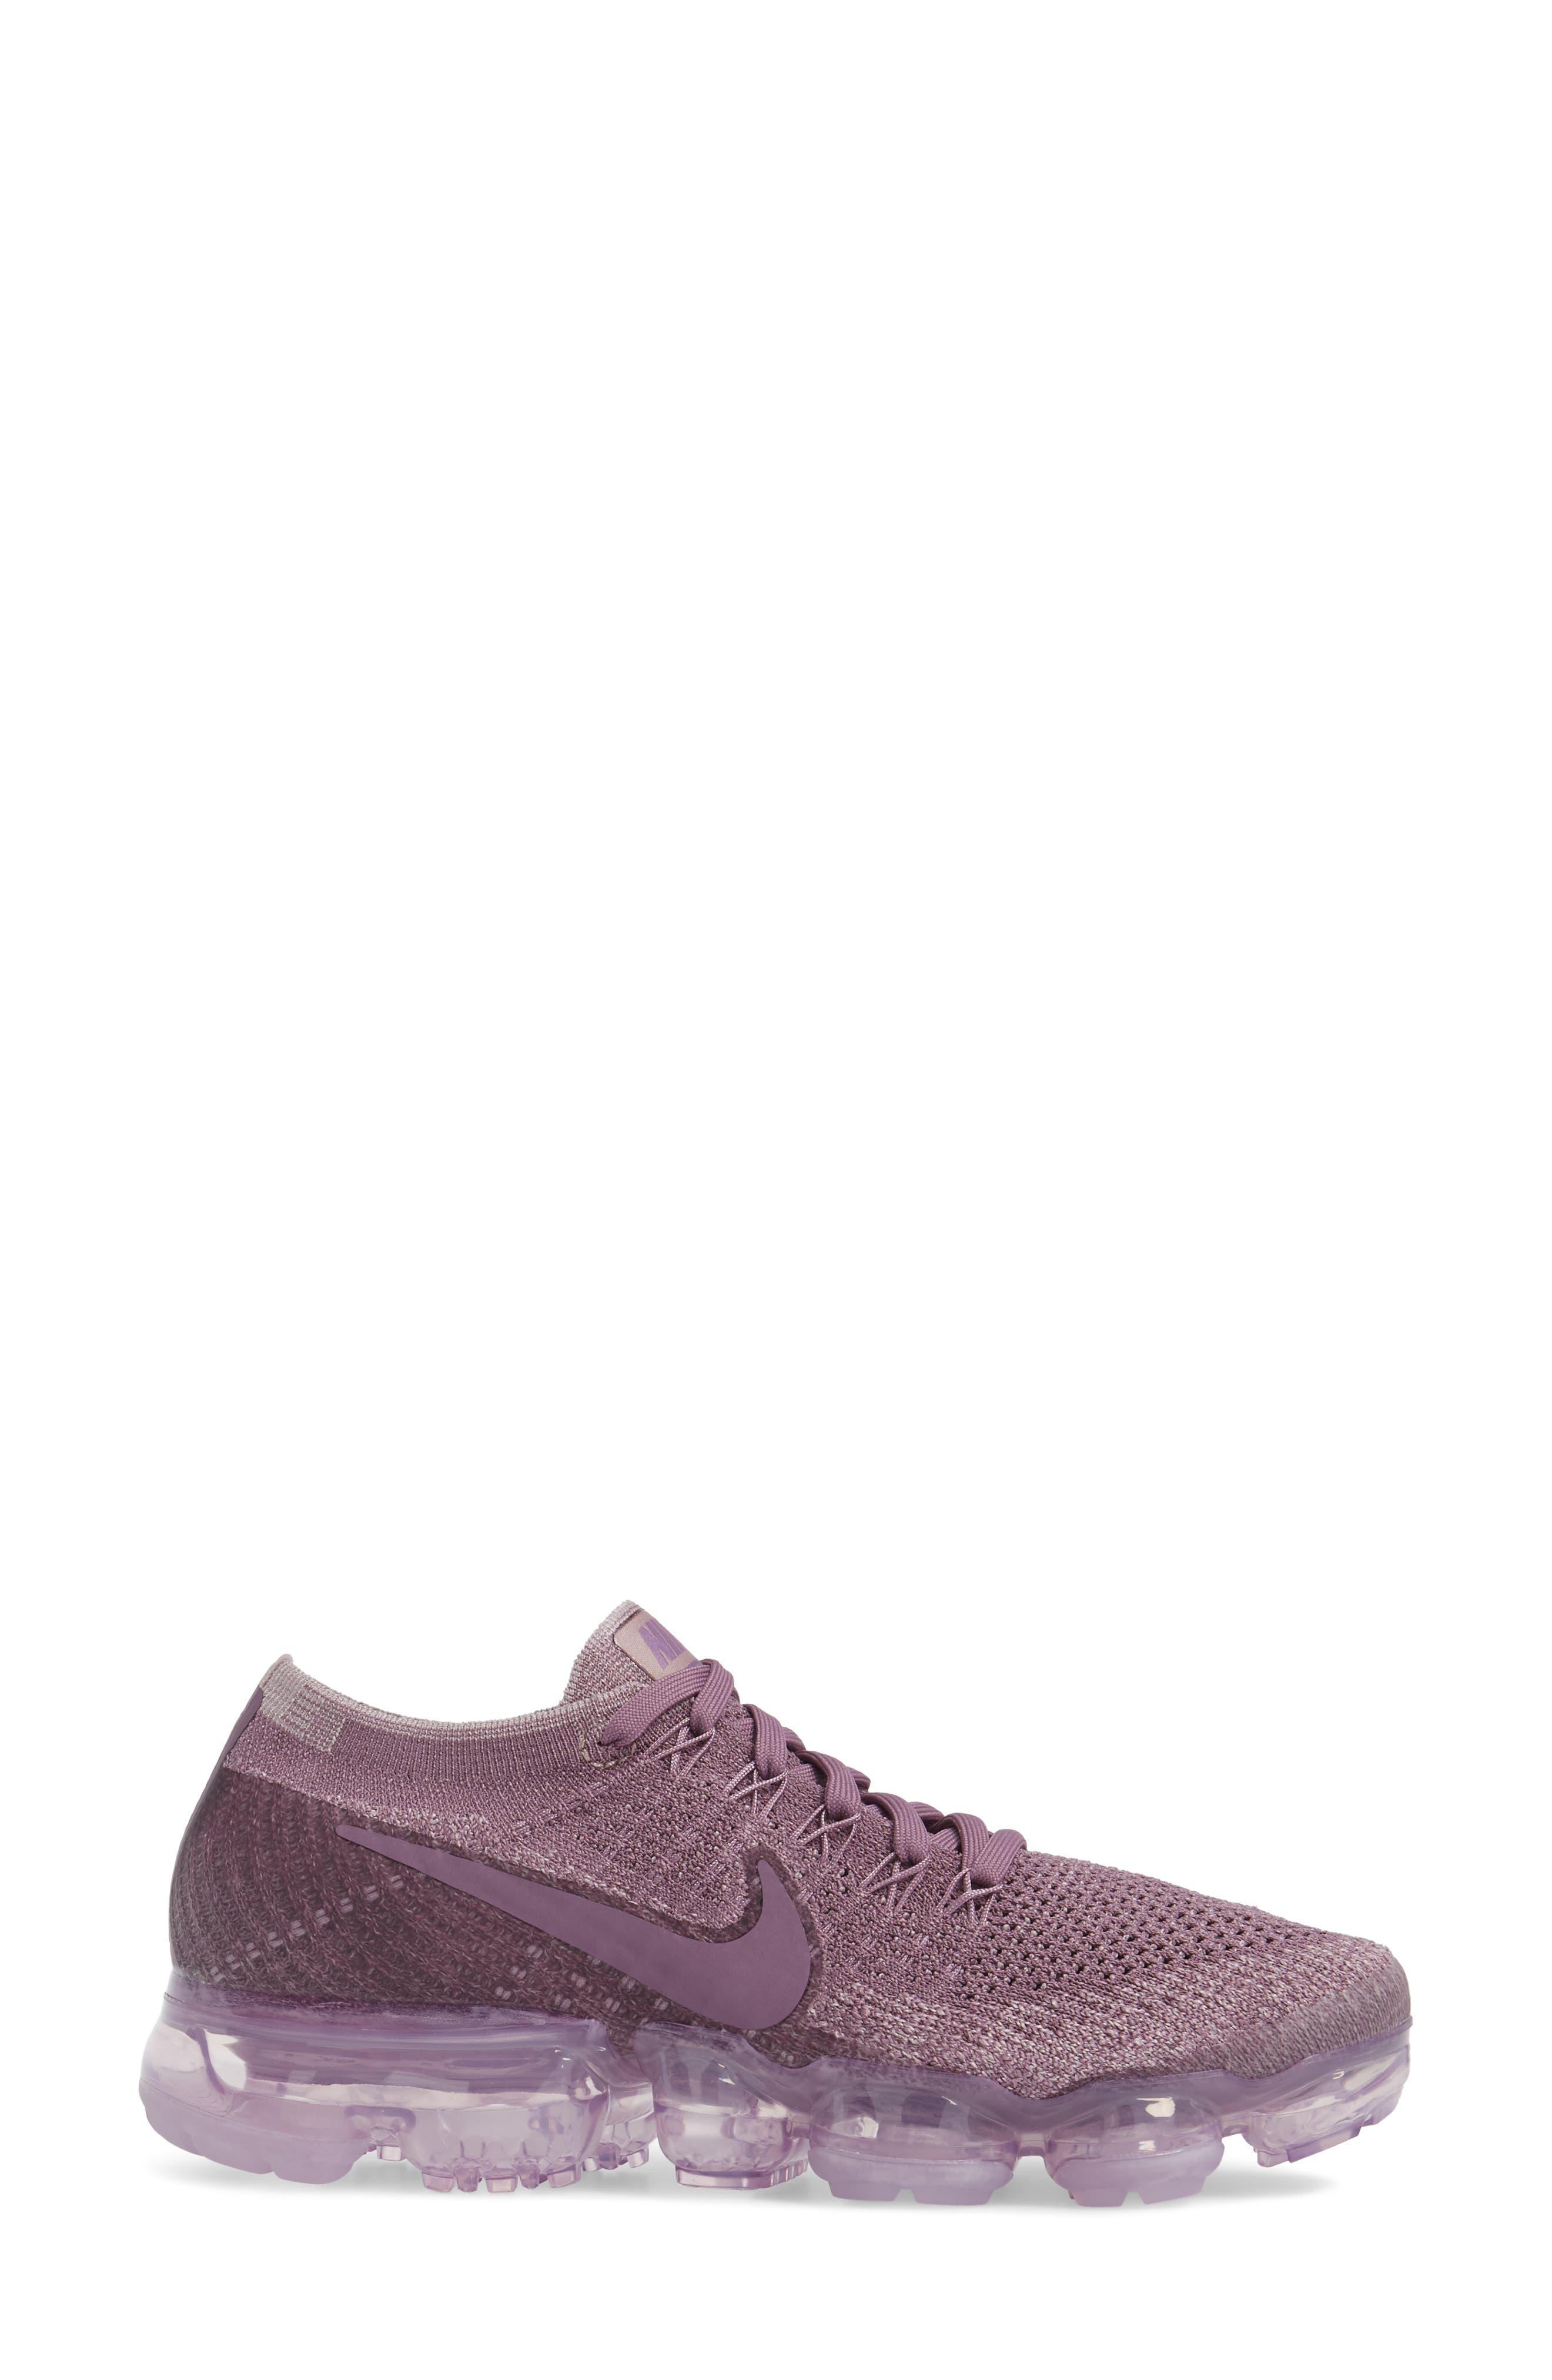 Air VaporMax Flyknit Running Shoe,                             Alternate thumbnail 3, color,                             Violet Dust/ Plum Fog